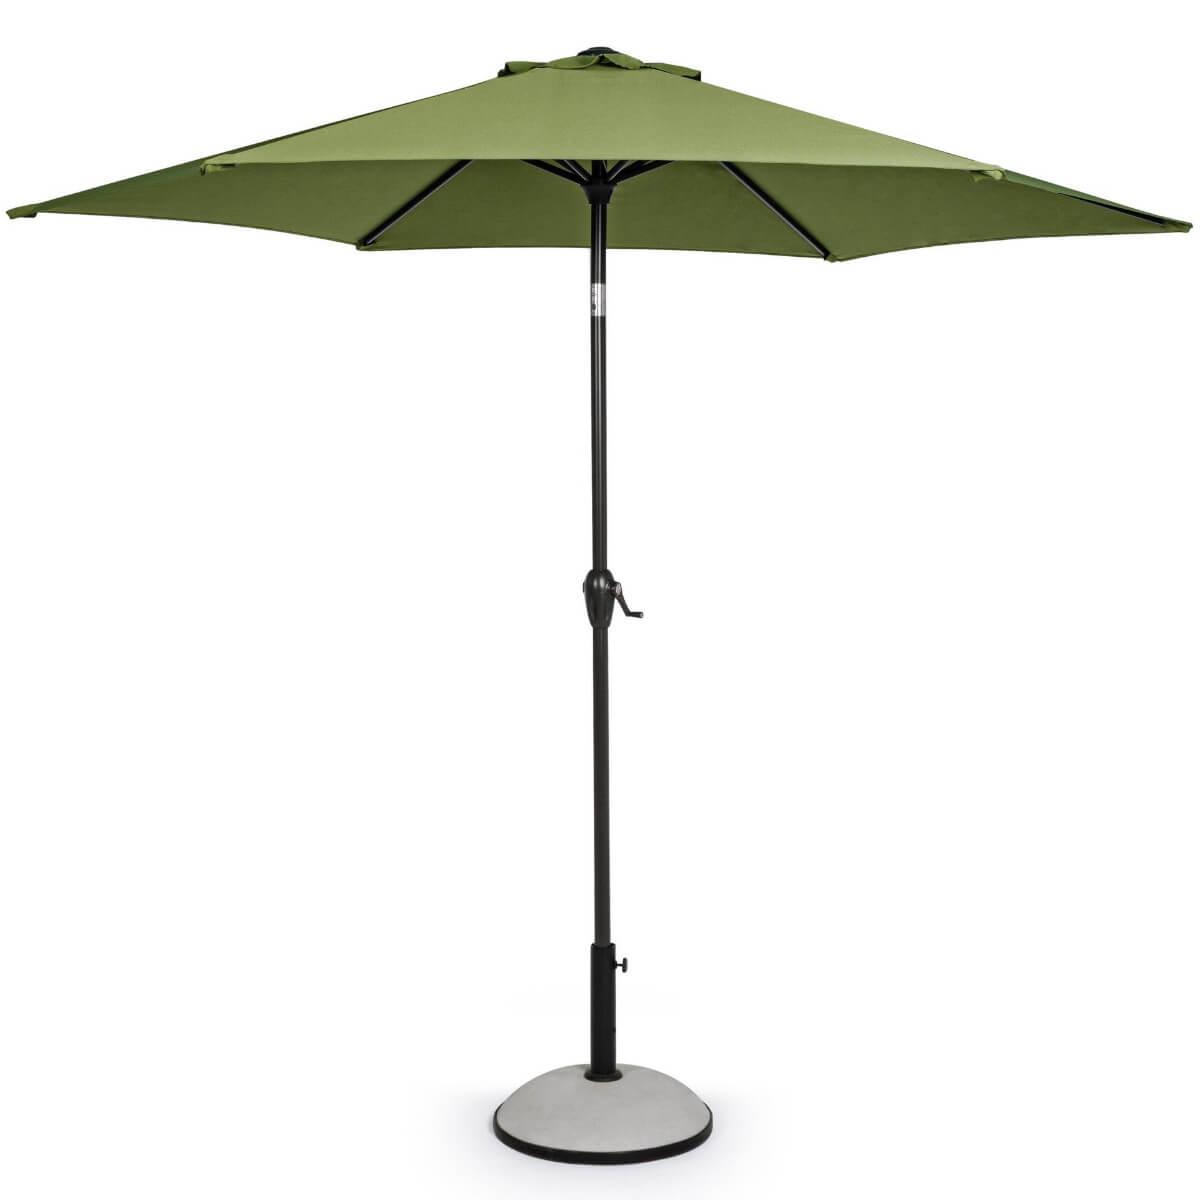 Зонт 4villa Салерно 270 см оливковый